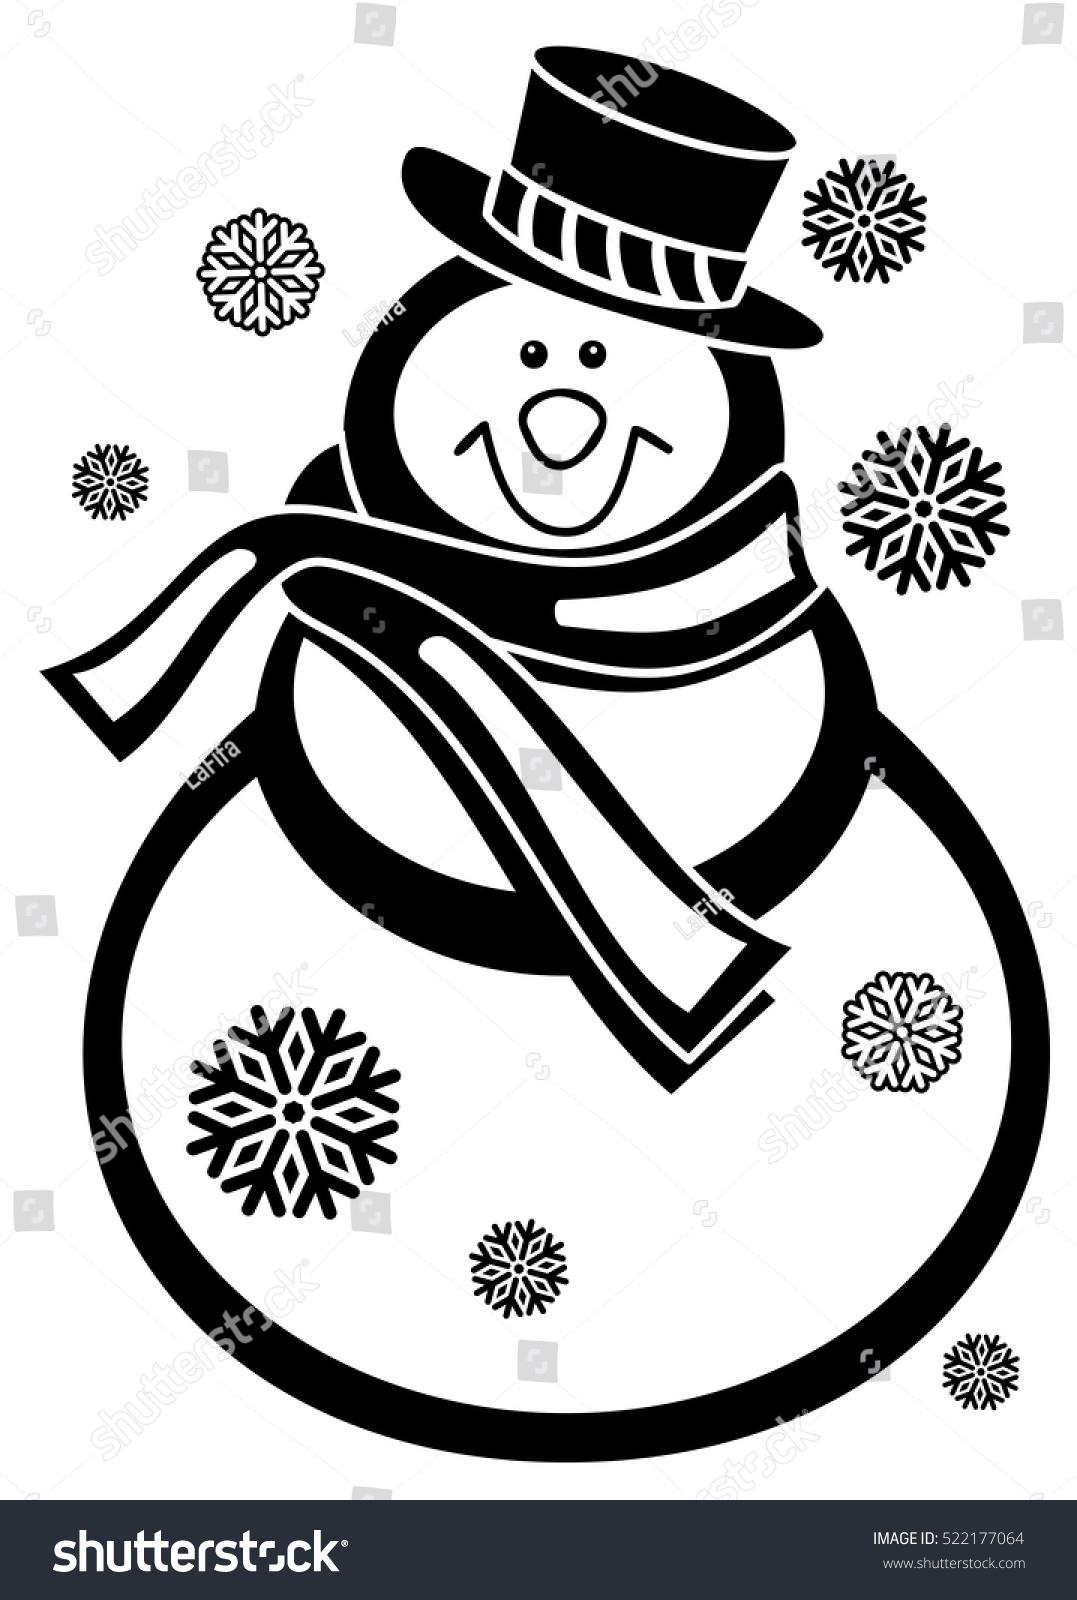 contour snowman snowflakes white background coloring เวกเตอร สต อก